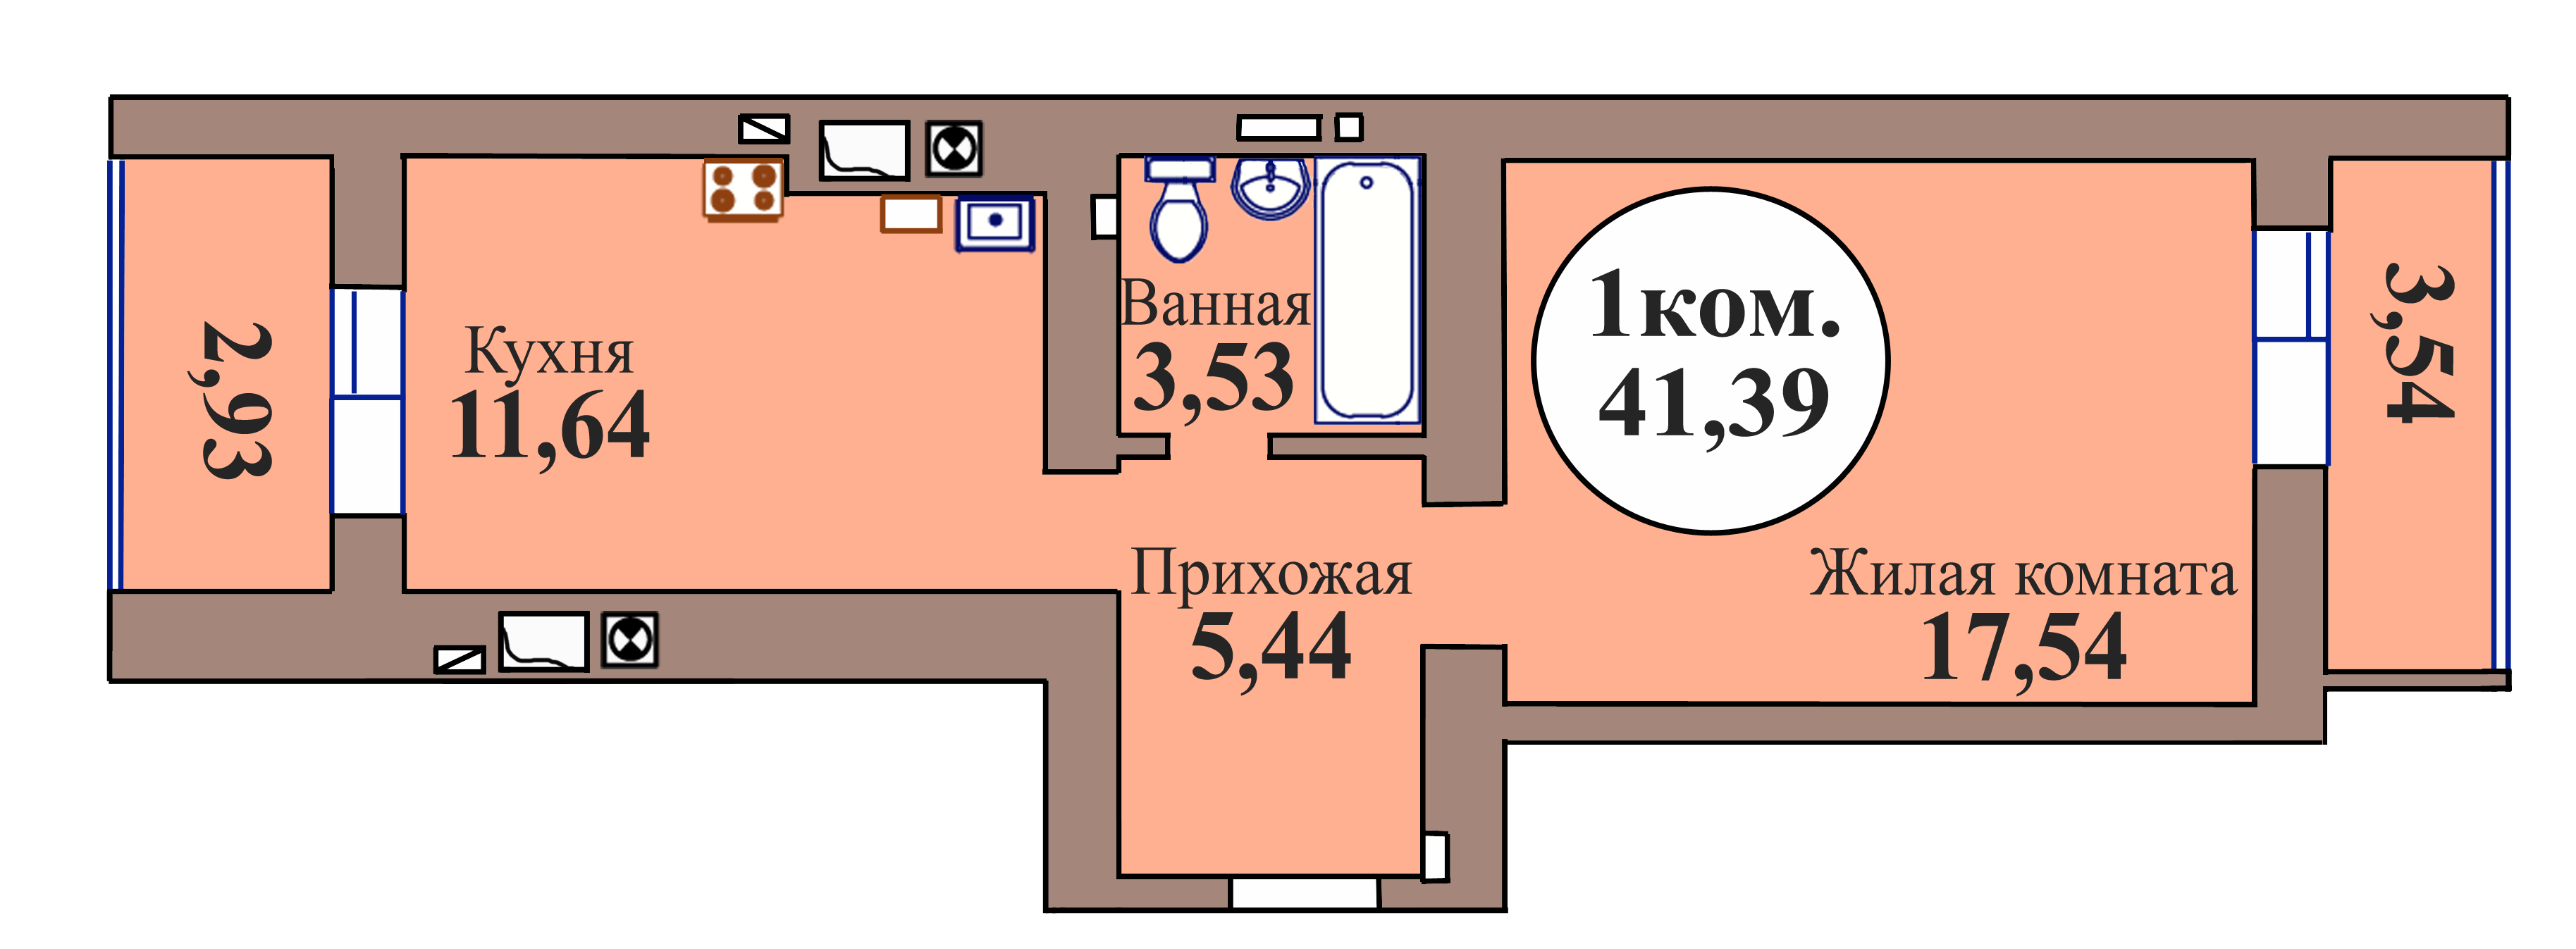 1-комн. кв. по пер. Калининградский, 5 кв. 7 в Калининграде